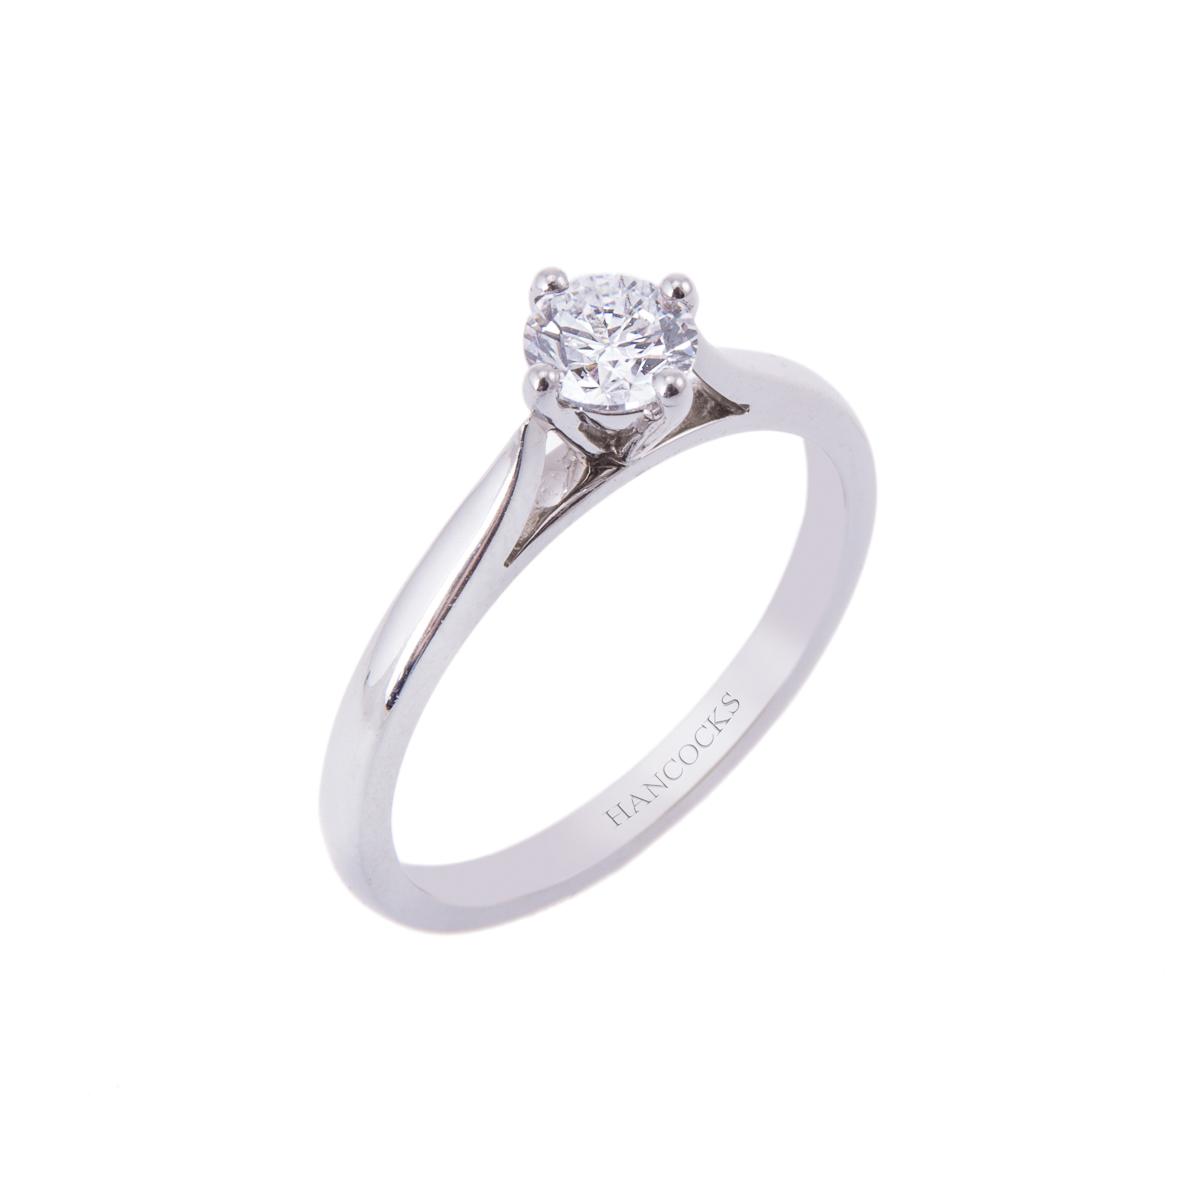 gia certificated brilliant cut diamond single stone ring